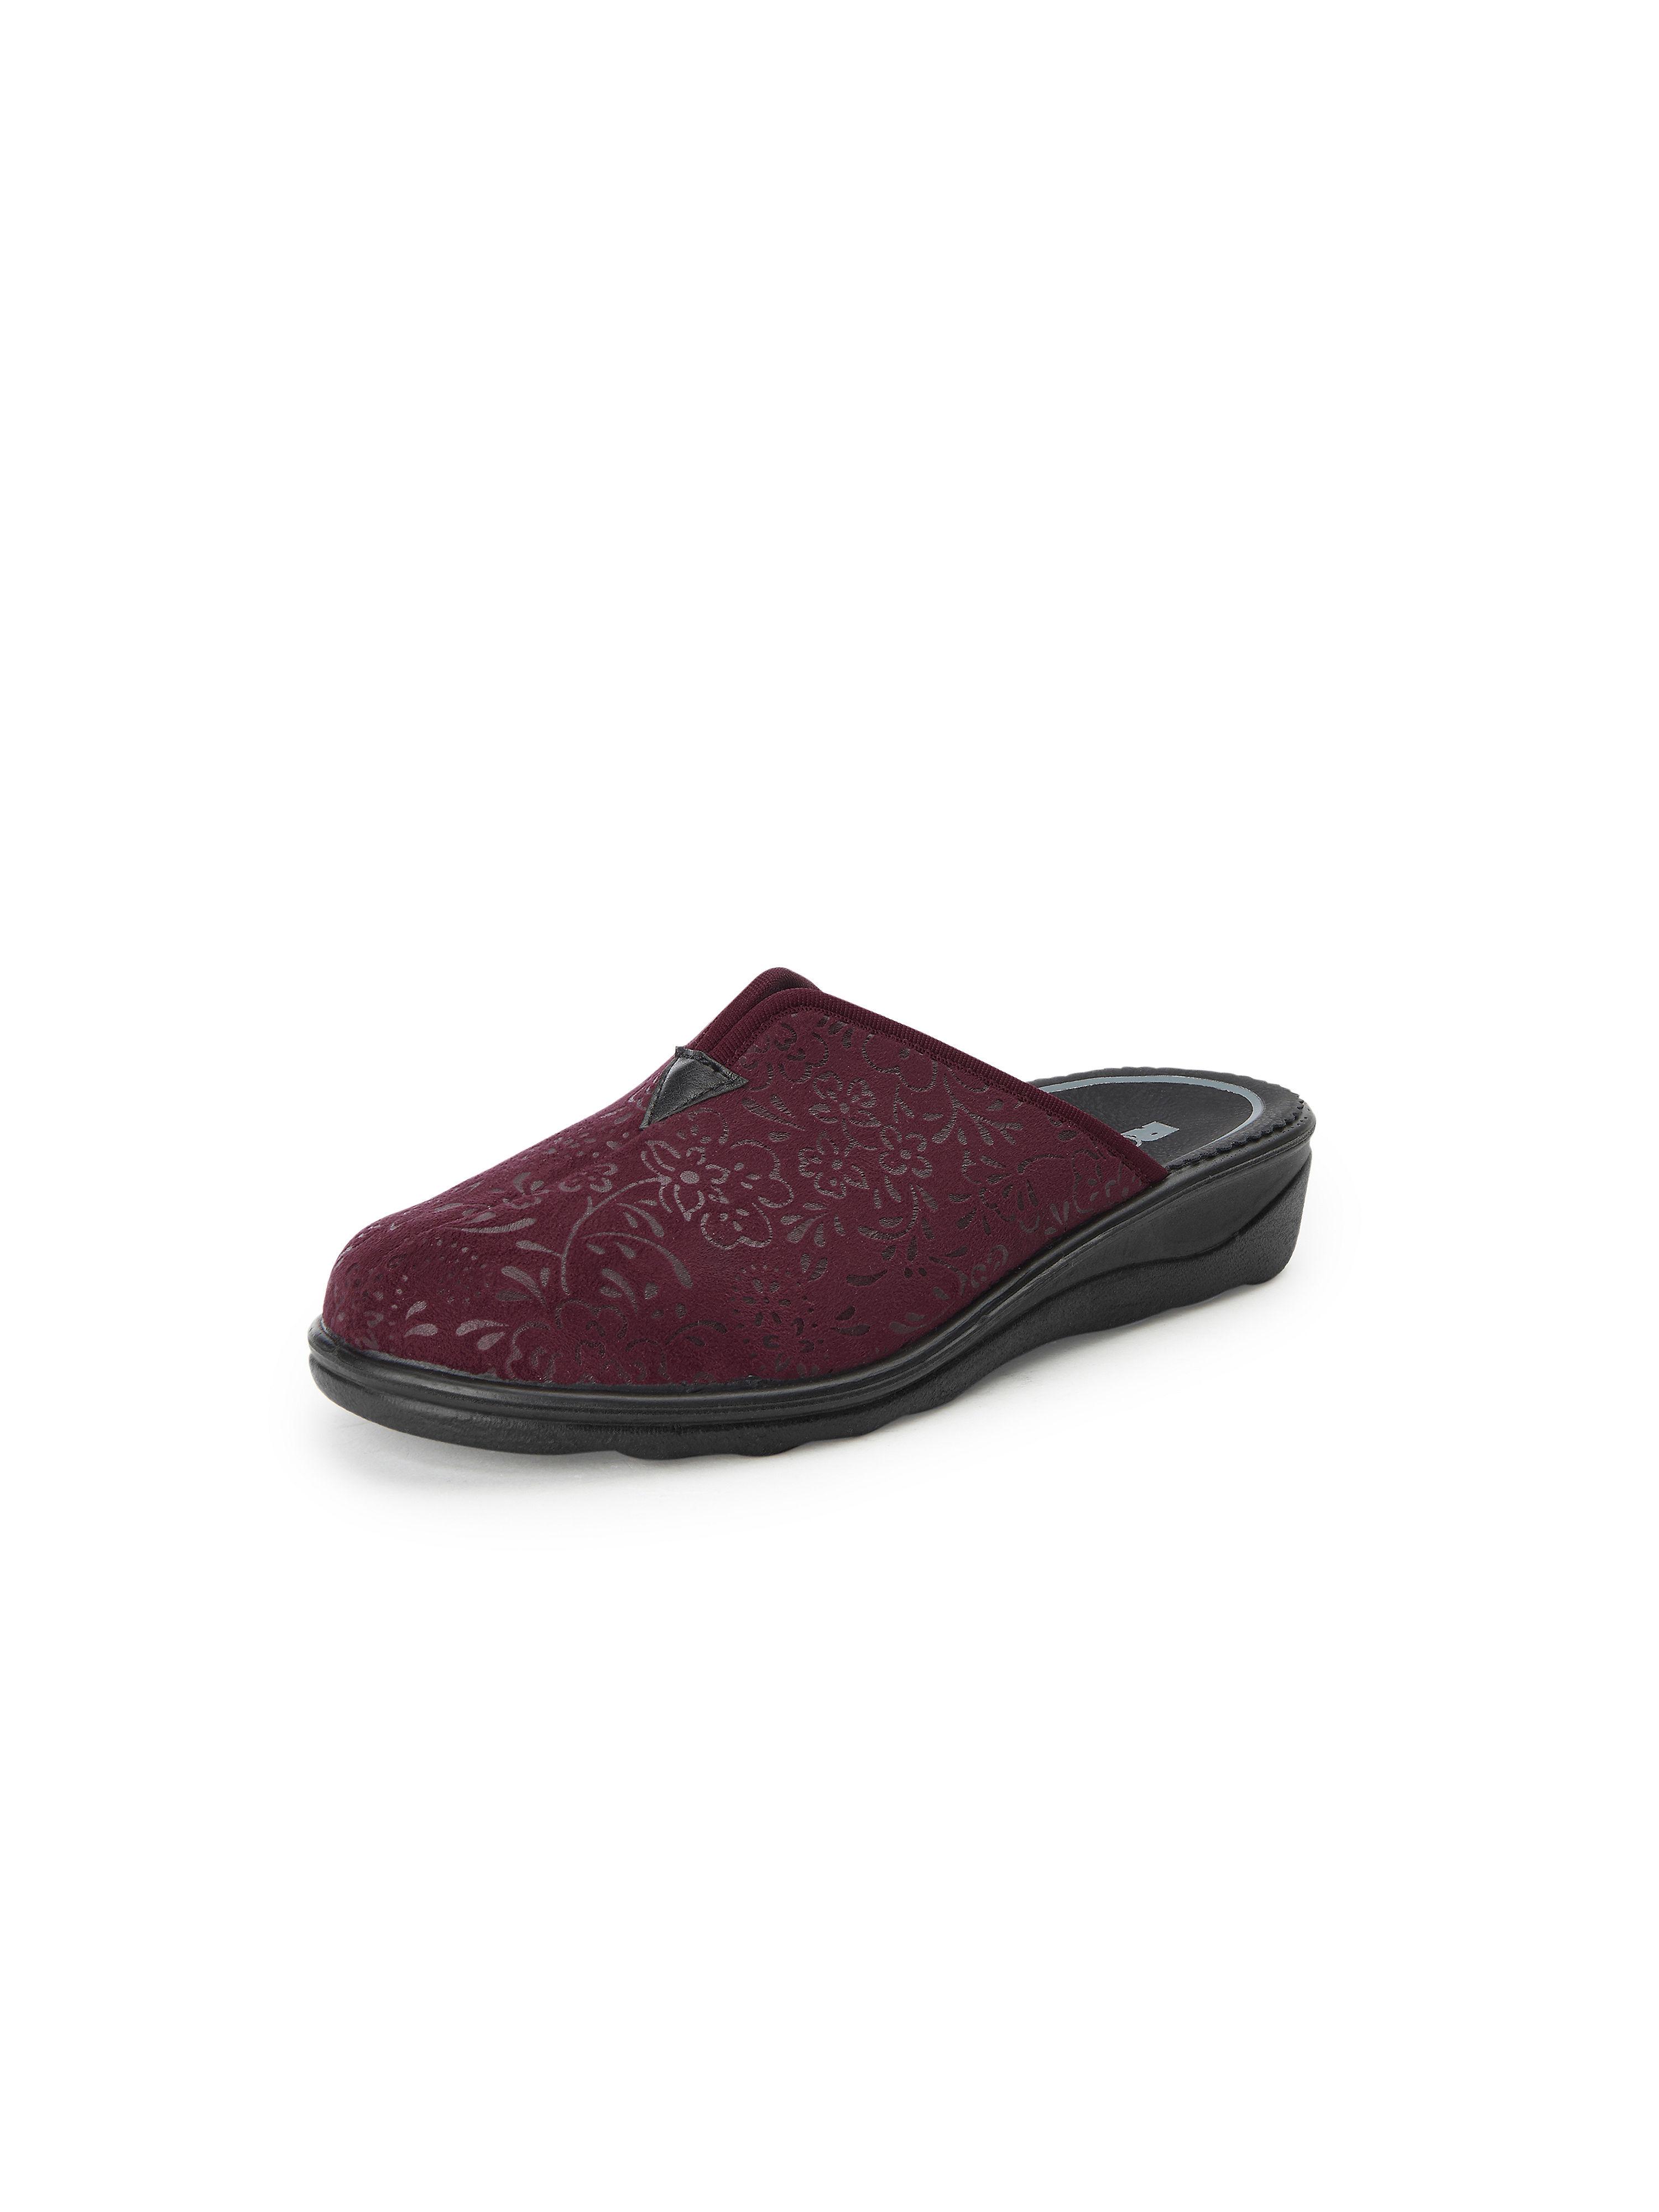 Pantoffels, model Romisana 82 Van Romika rood